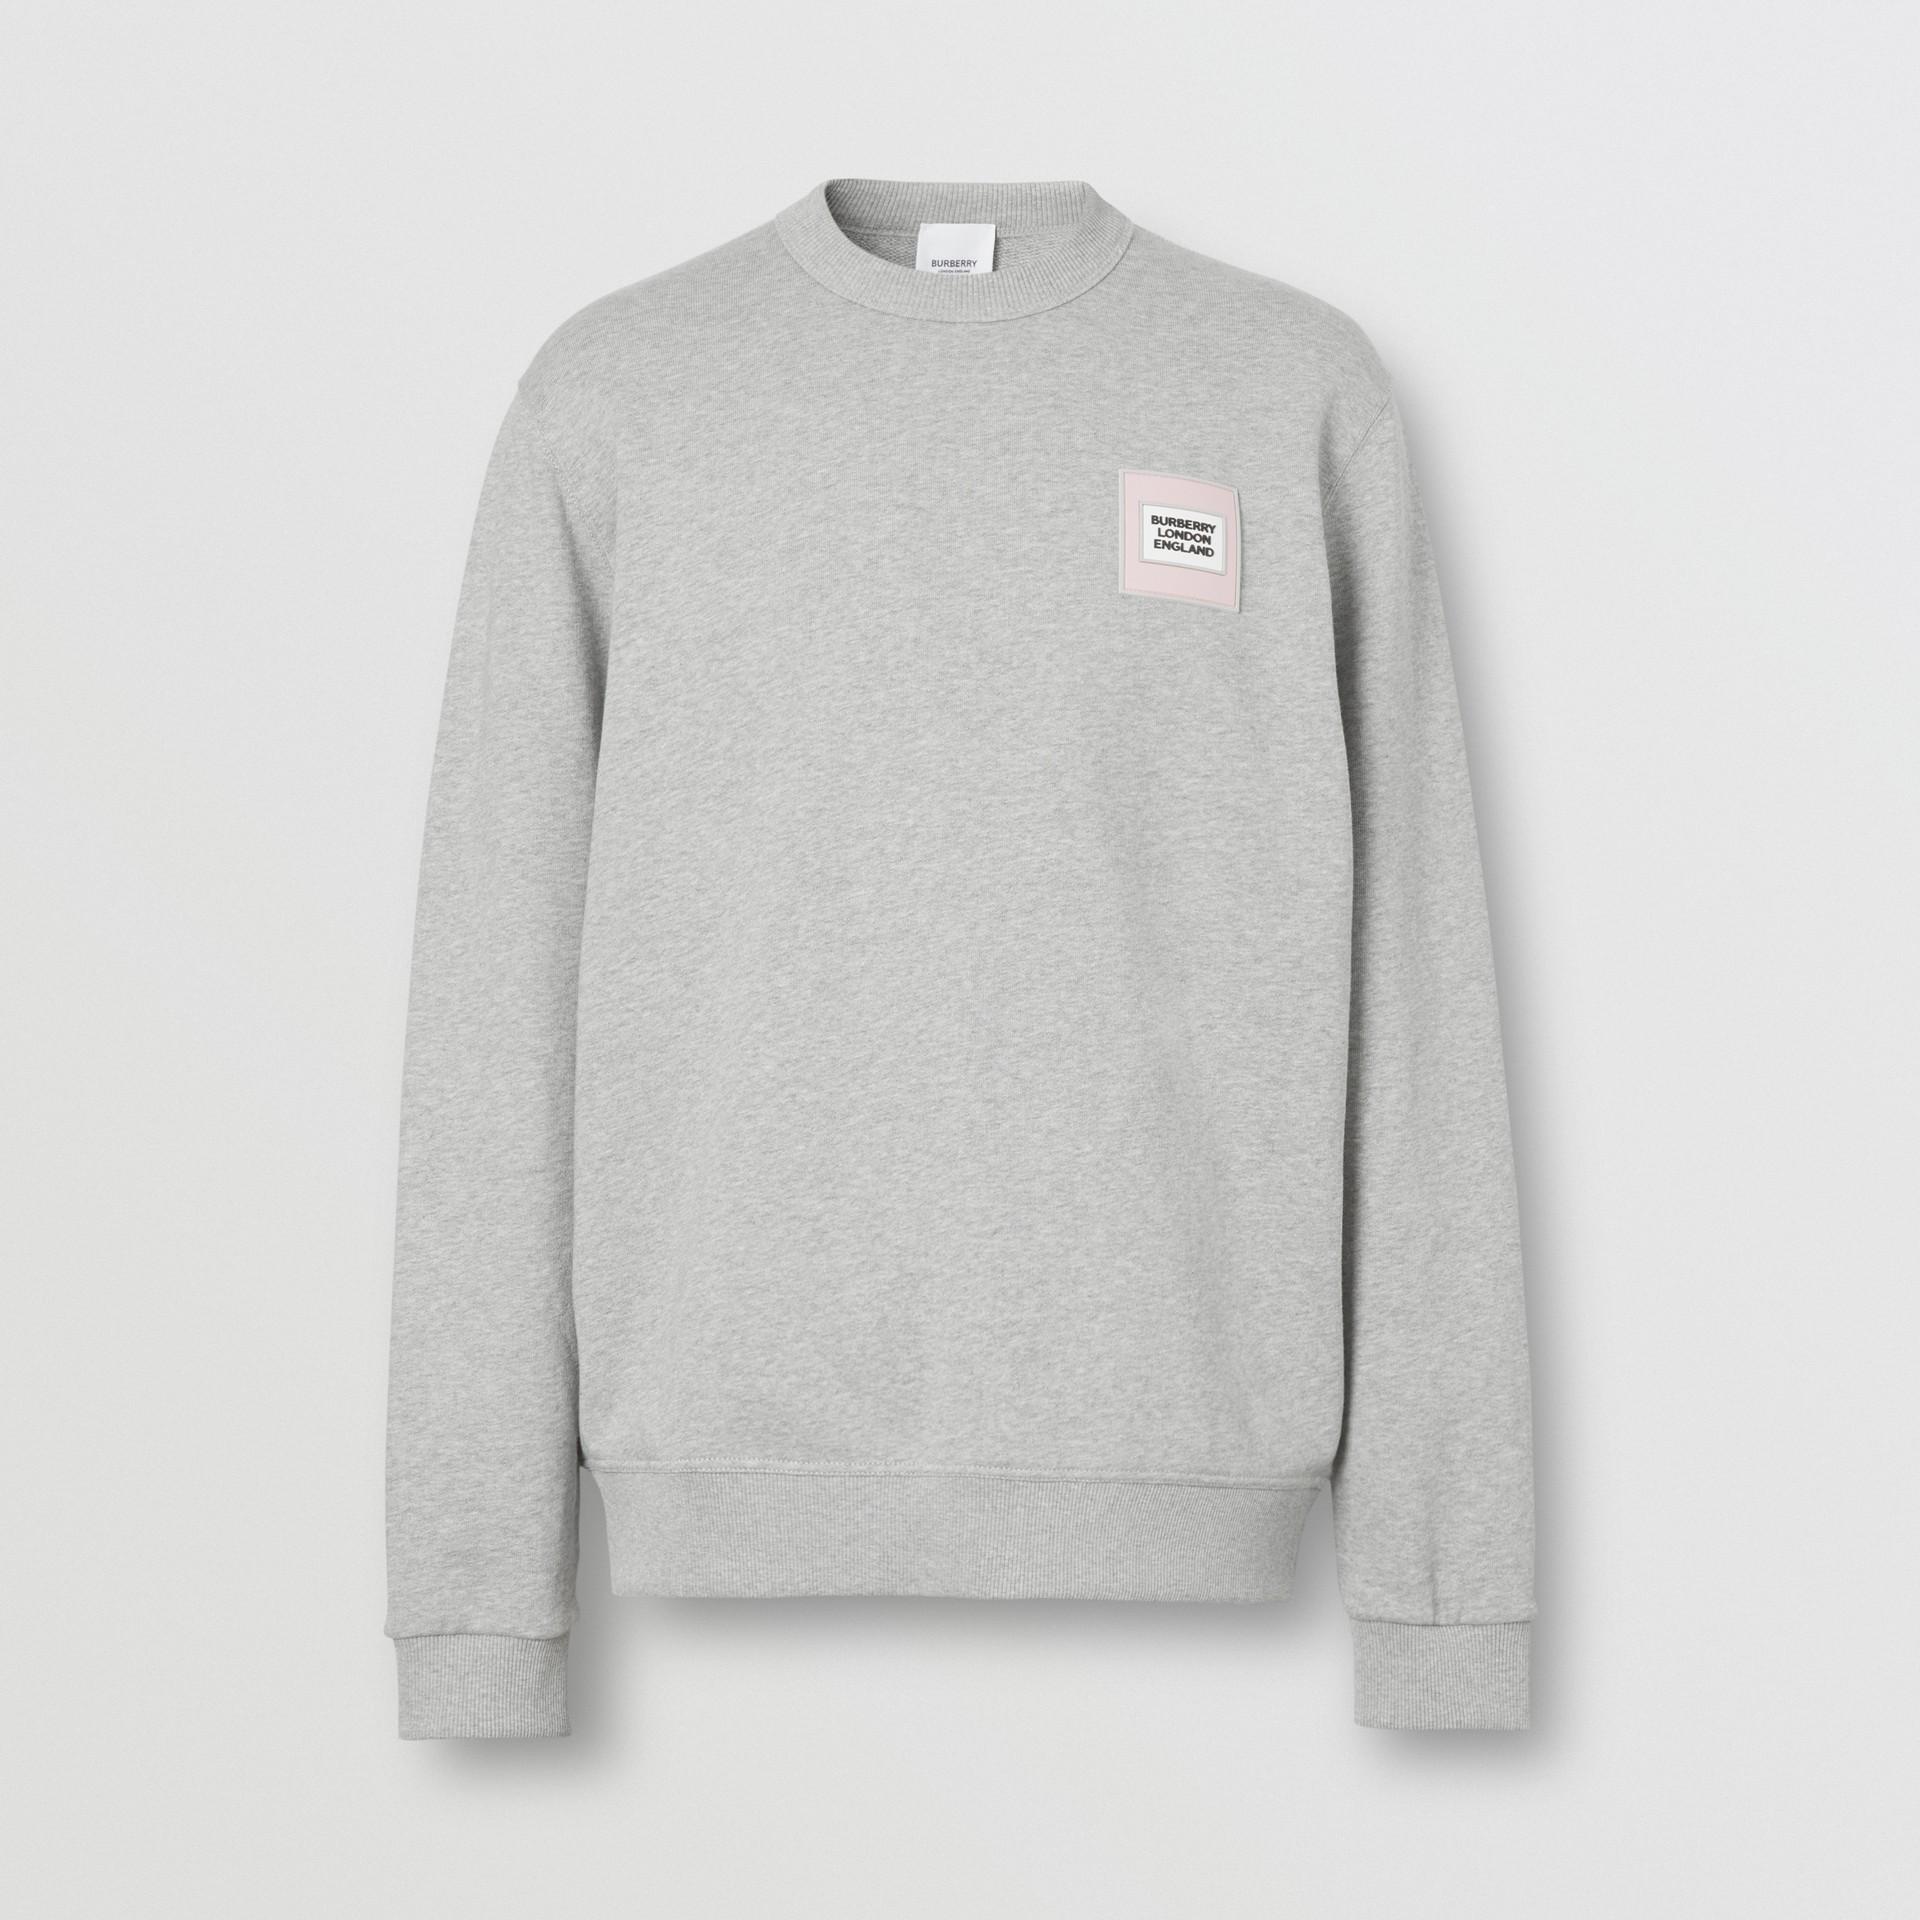 Logo Appliqué Cotton Sweatshirt in Pale Grey Melange - Men | Burberry United Kingdom - gallery image 3